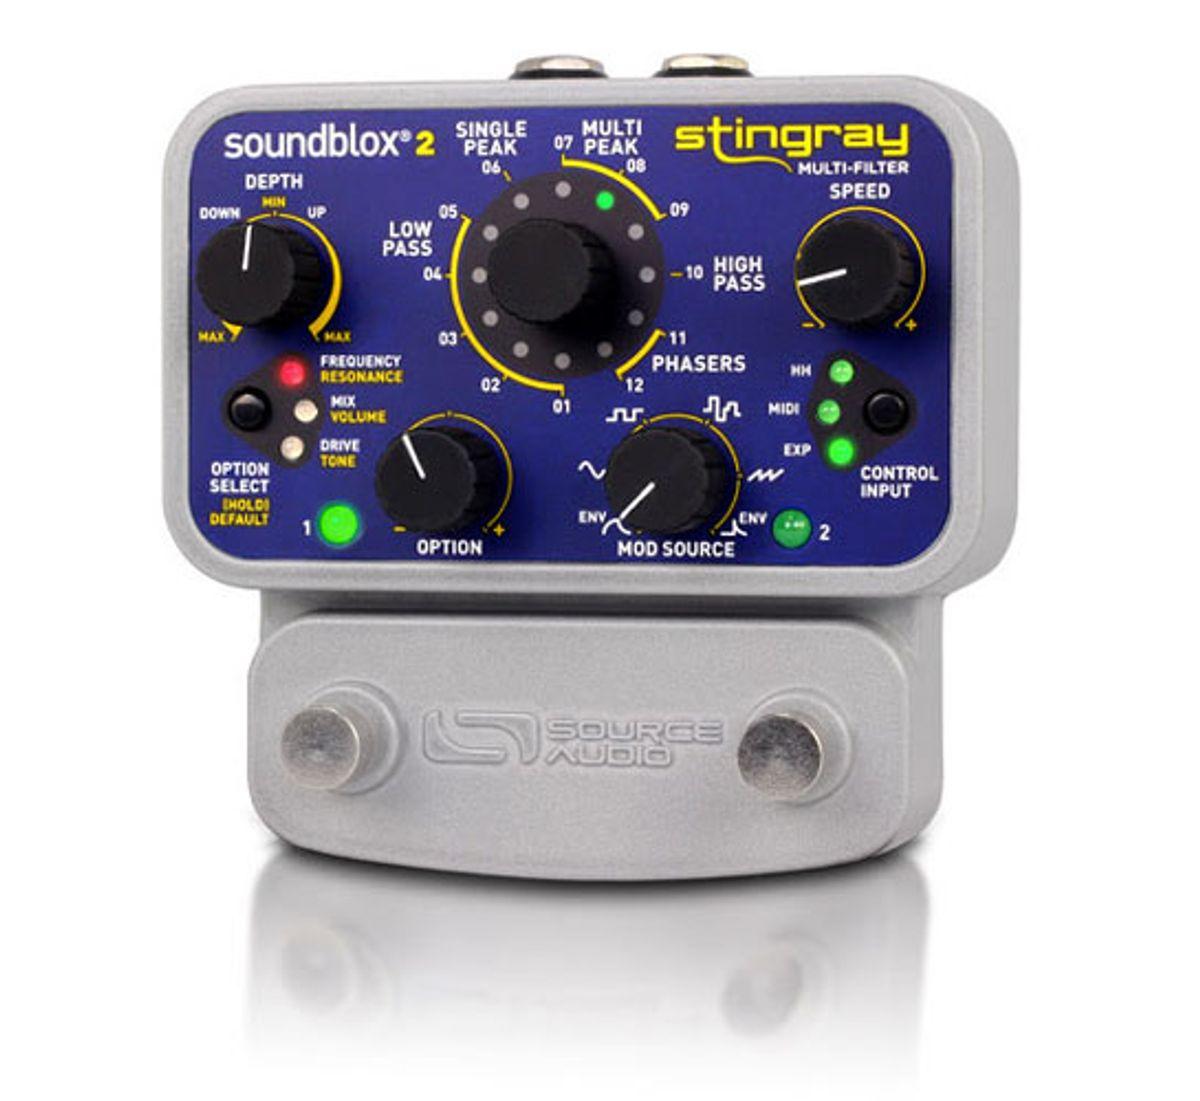 Source Audio Unveils the Soundblox 2 Stingray Multi-Filter